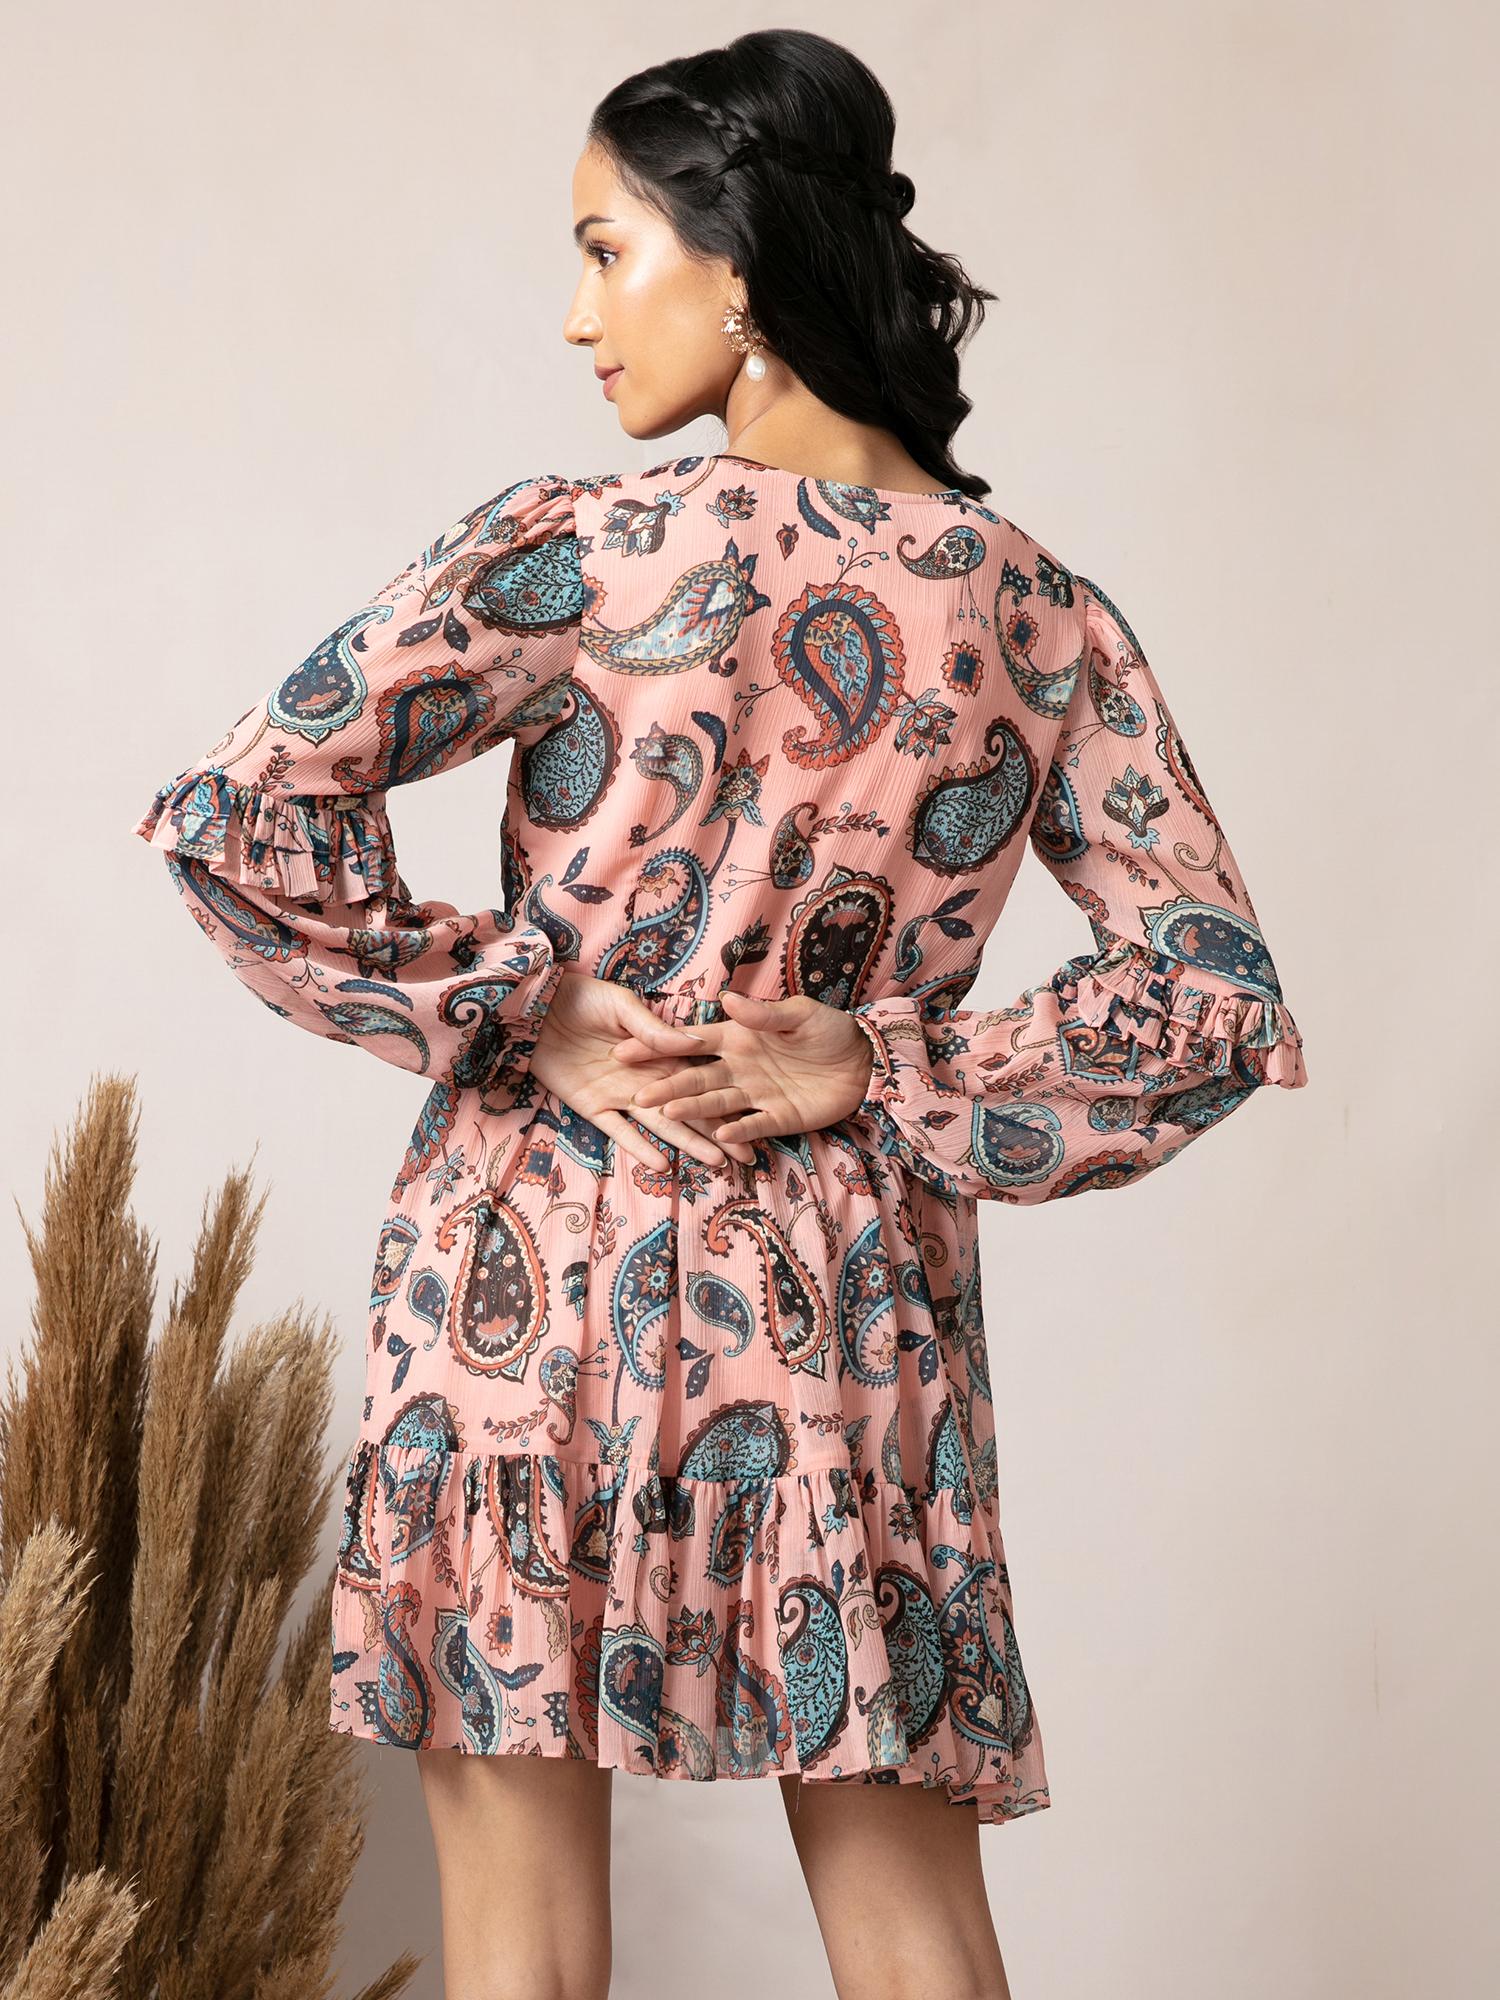 Dresses-The Bohemian Beauty Dress3